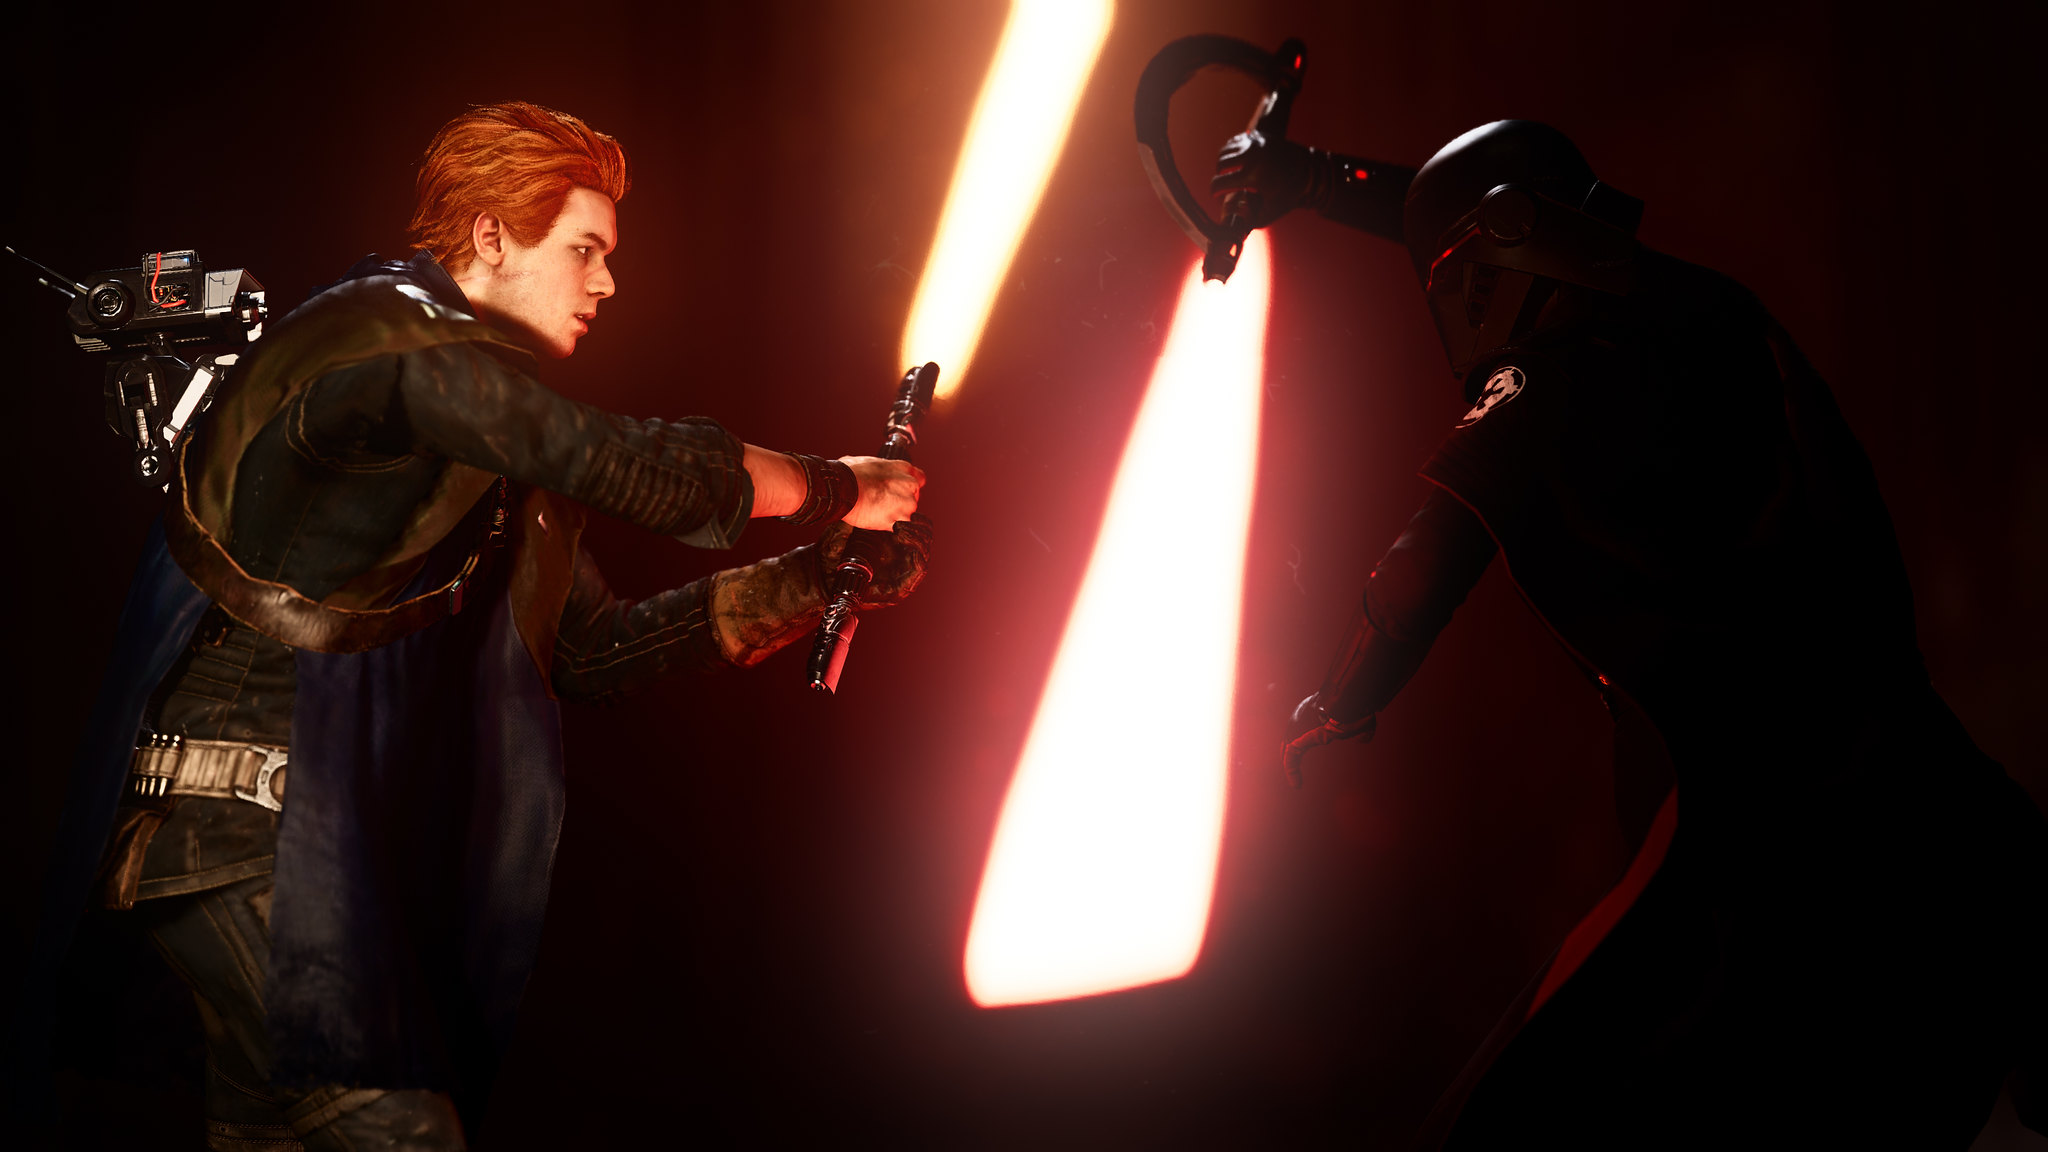 49188408757_1d7d27fc92_k.jpg - Star Wars Jedi: Fallen Order